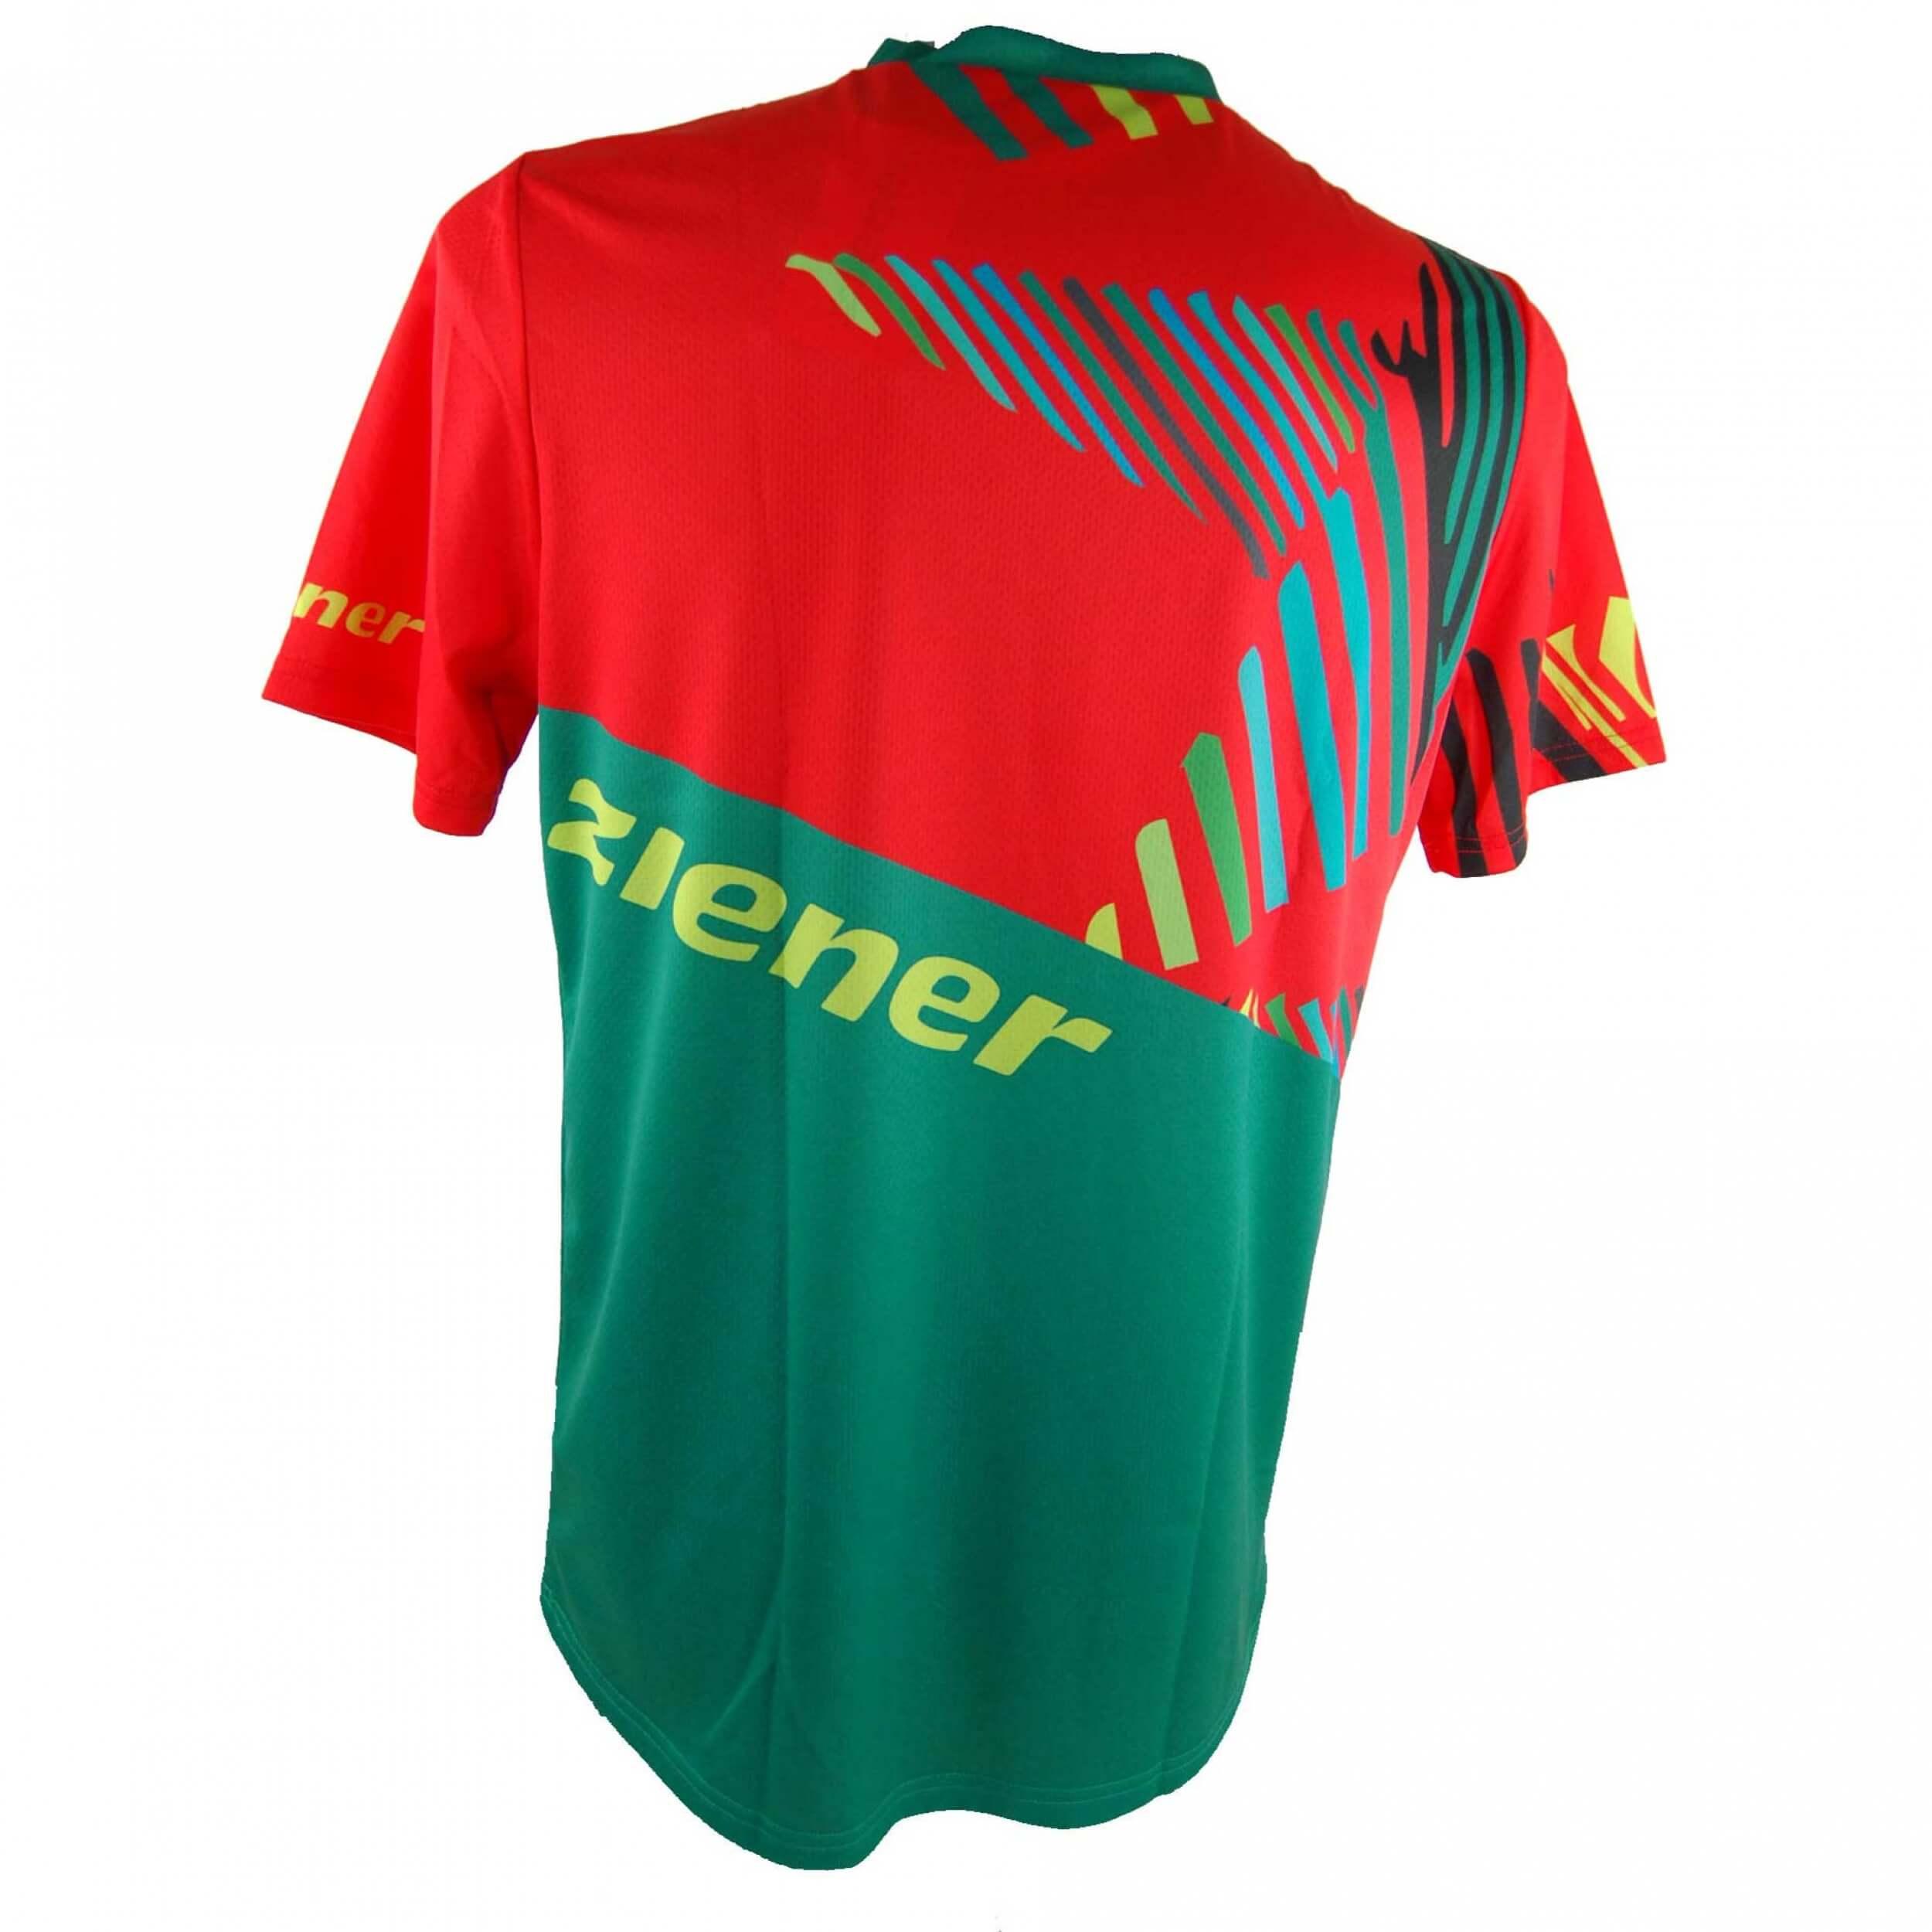 ZIENER Funktions Damen Bike Fahrradtrikot Teamwear VK01 rot grün 888 neu